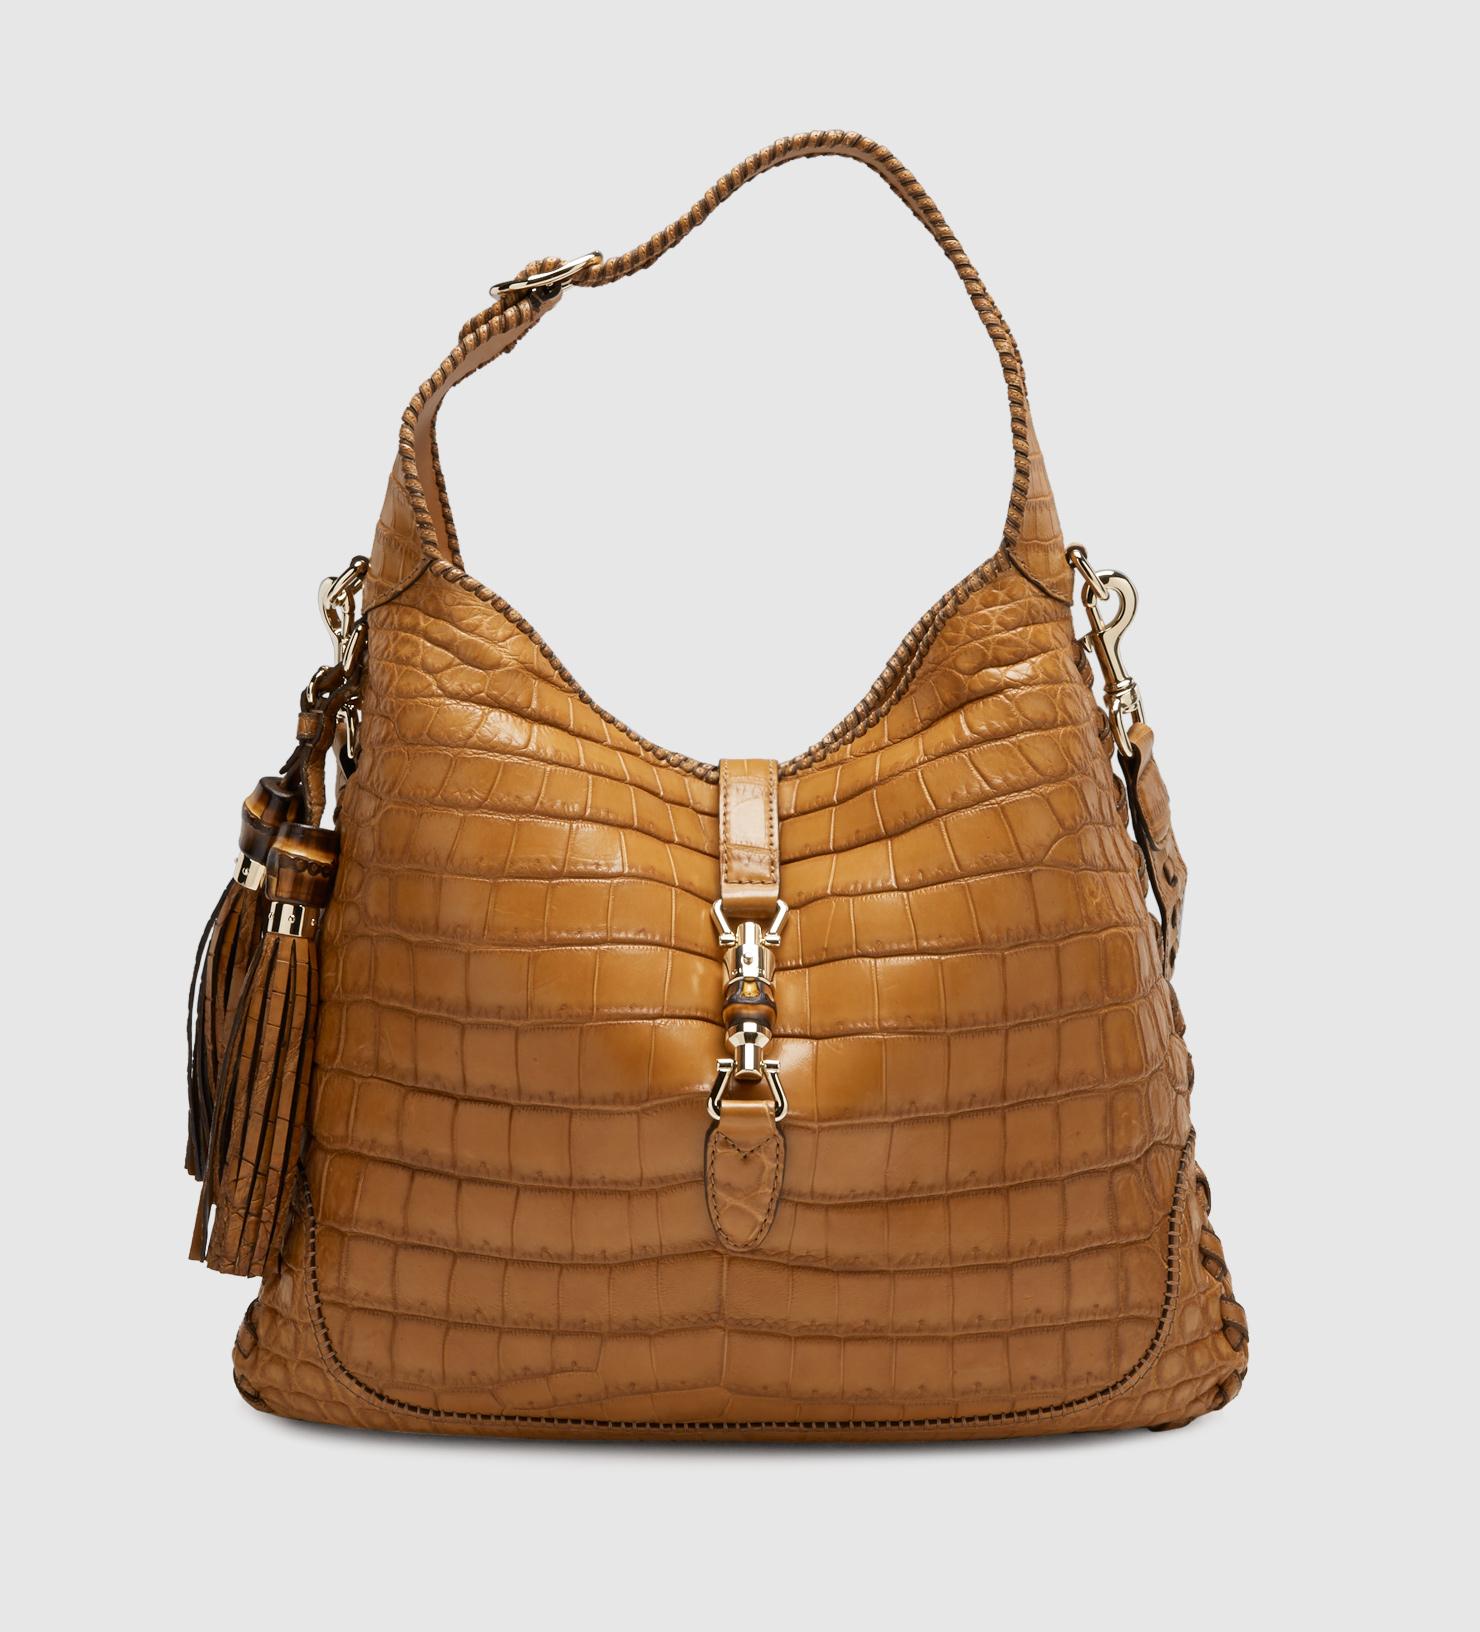 8ac467378a5 Gucci New Jackie Crocodile Shoulder Bag in Brown - Lyst